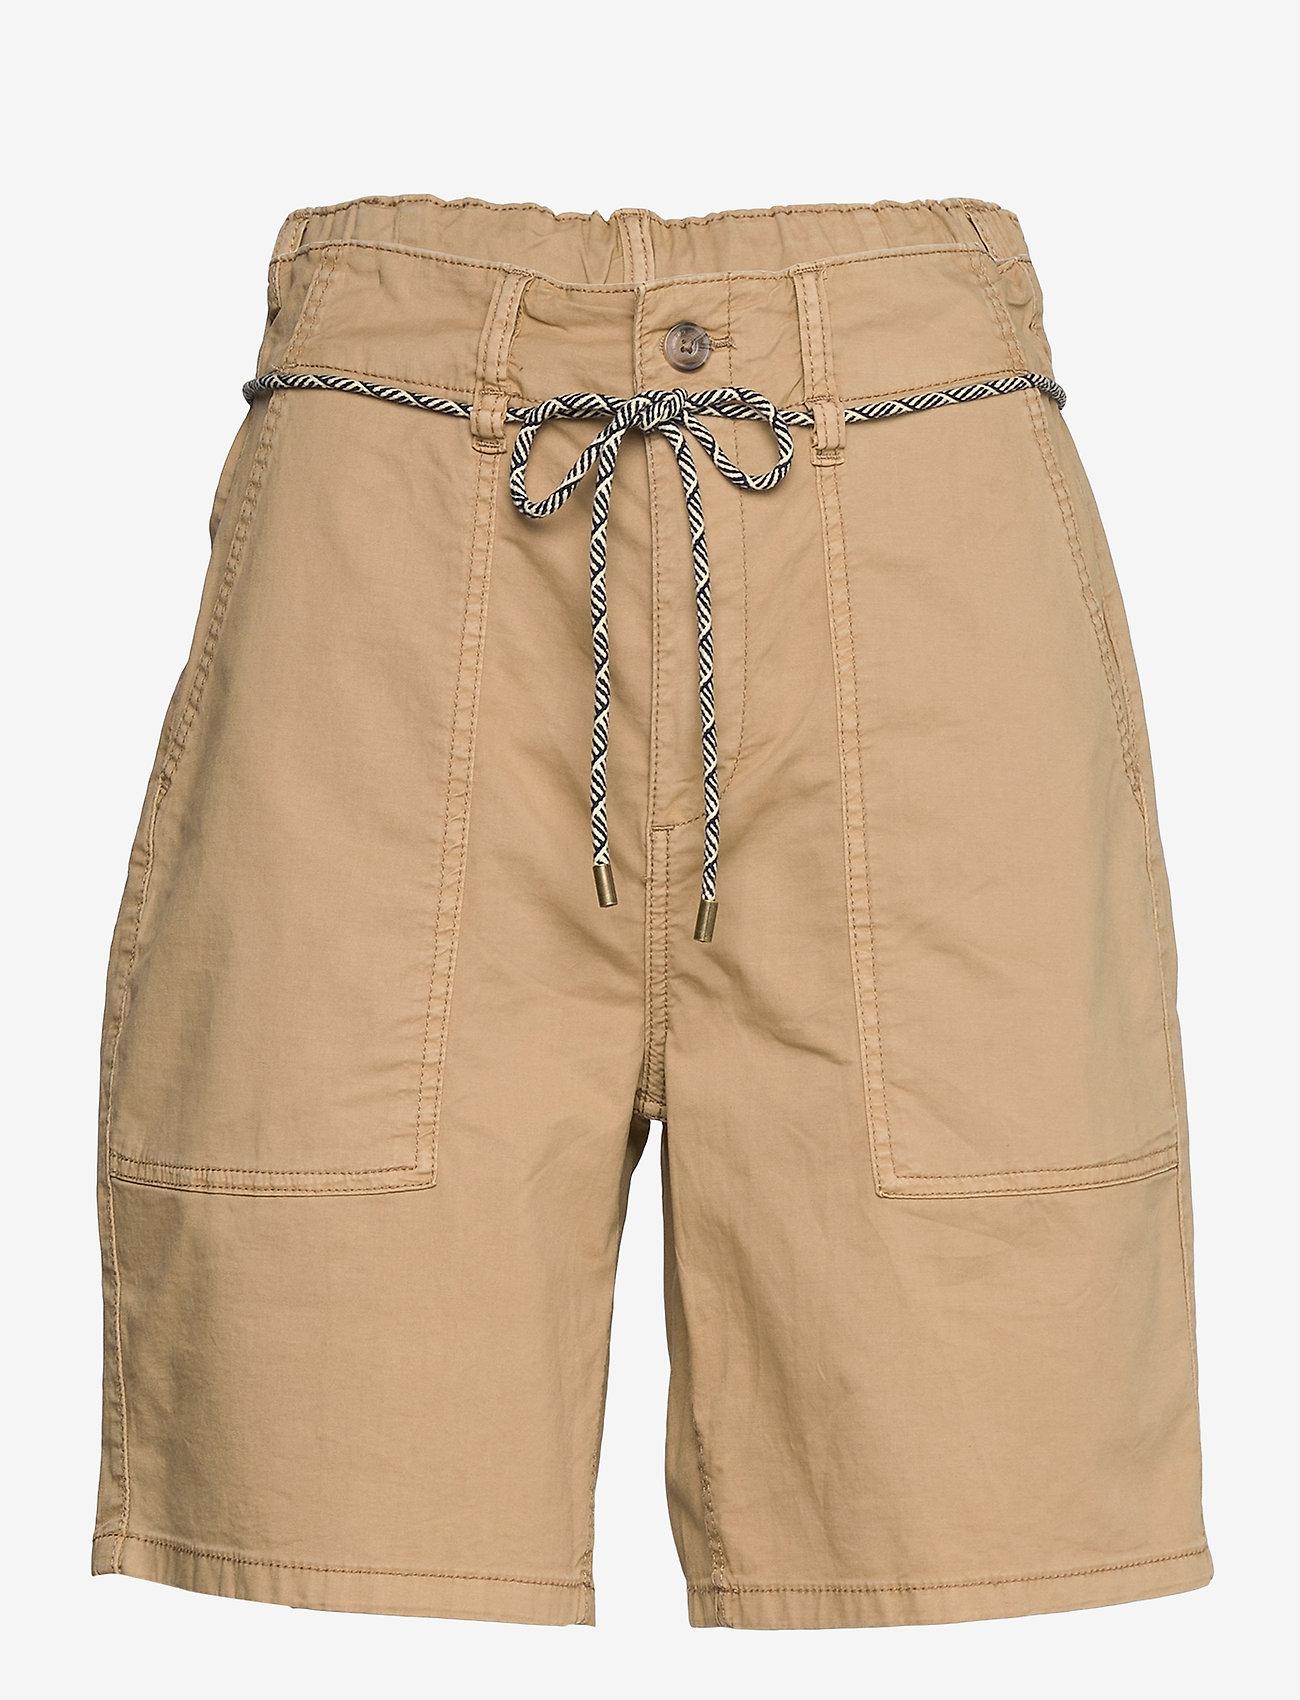 Esprit Casual - Shorts woven - chino shorts - camel - 0